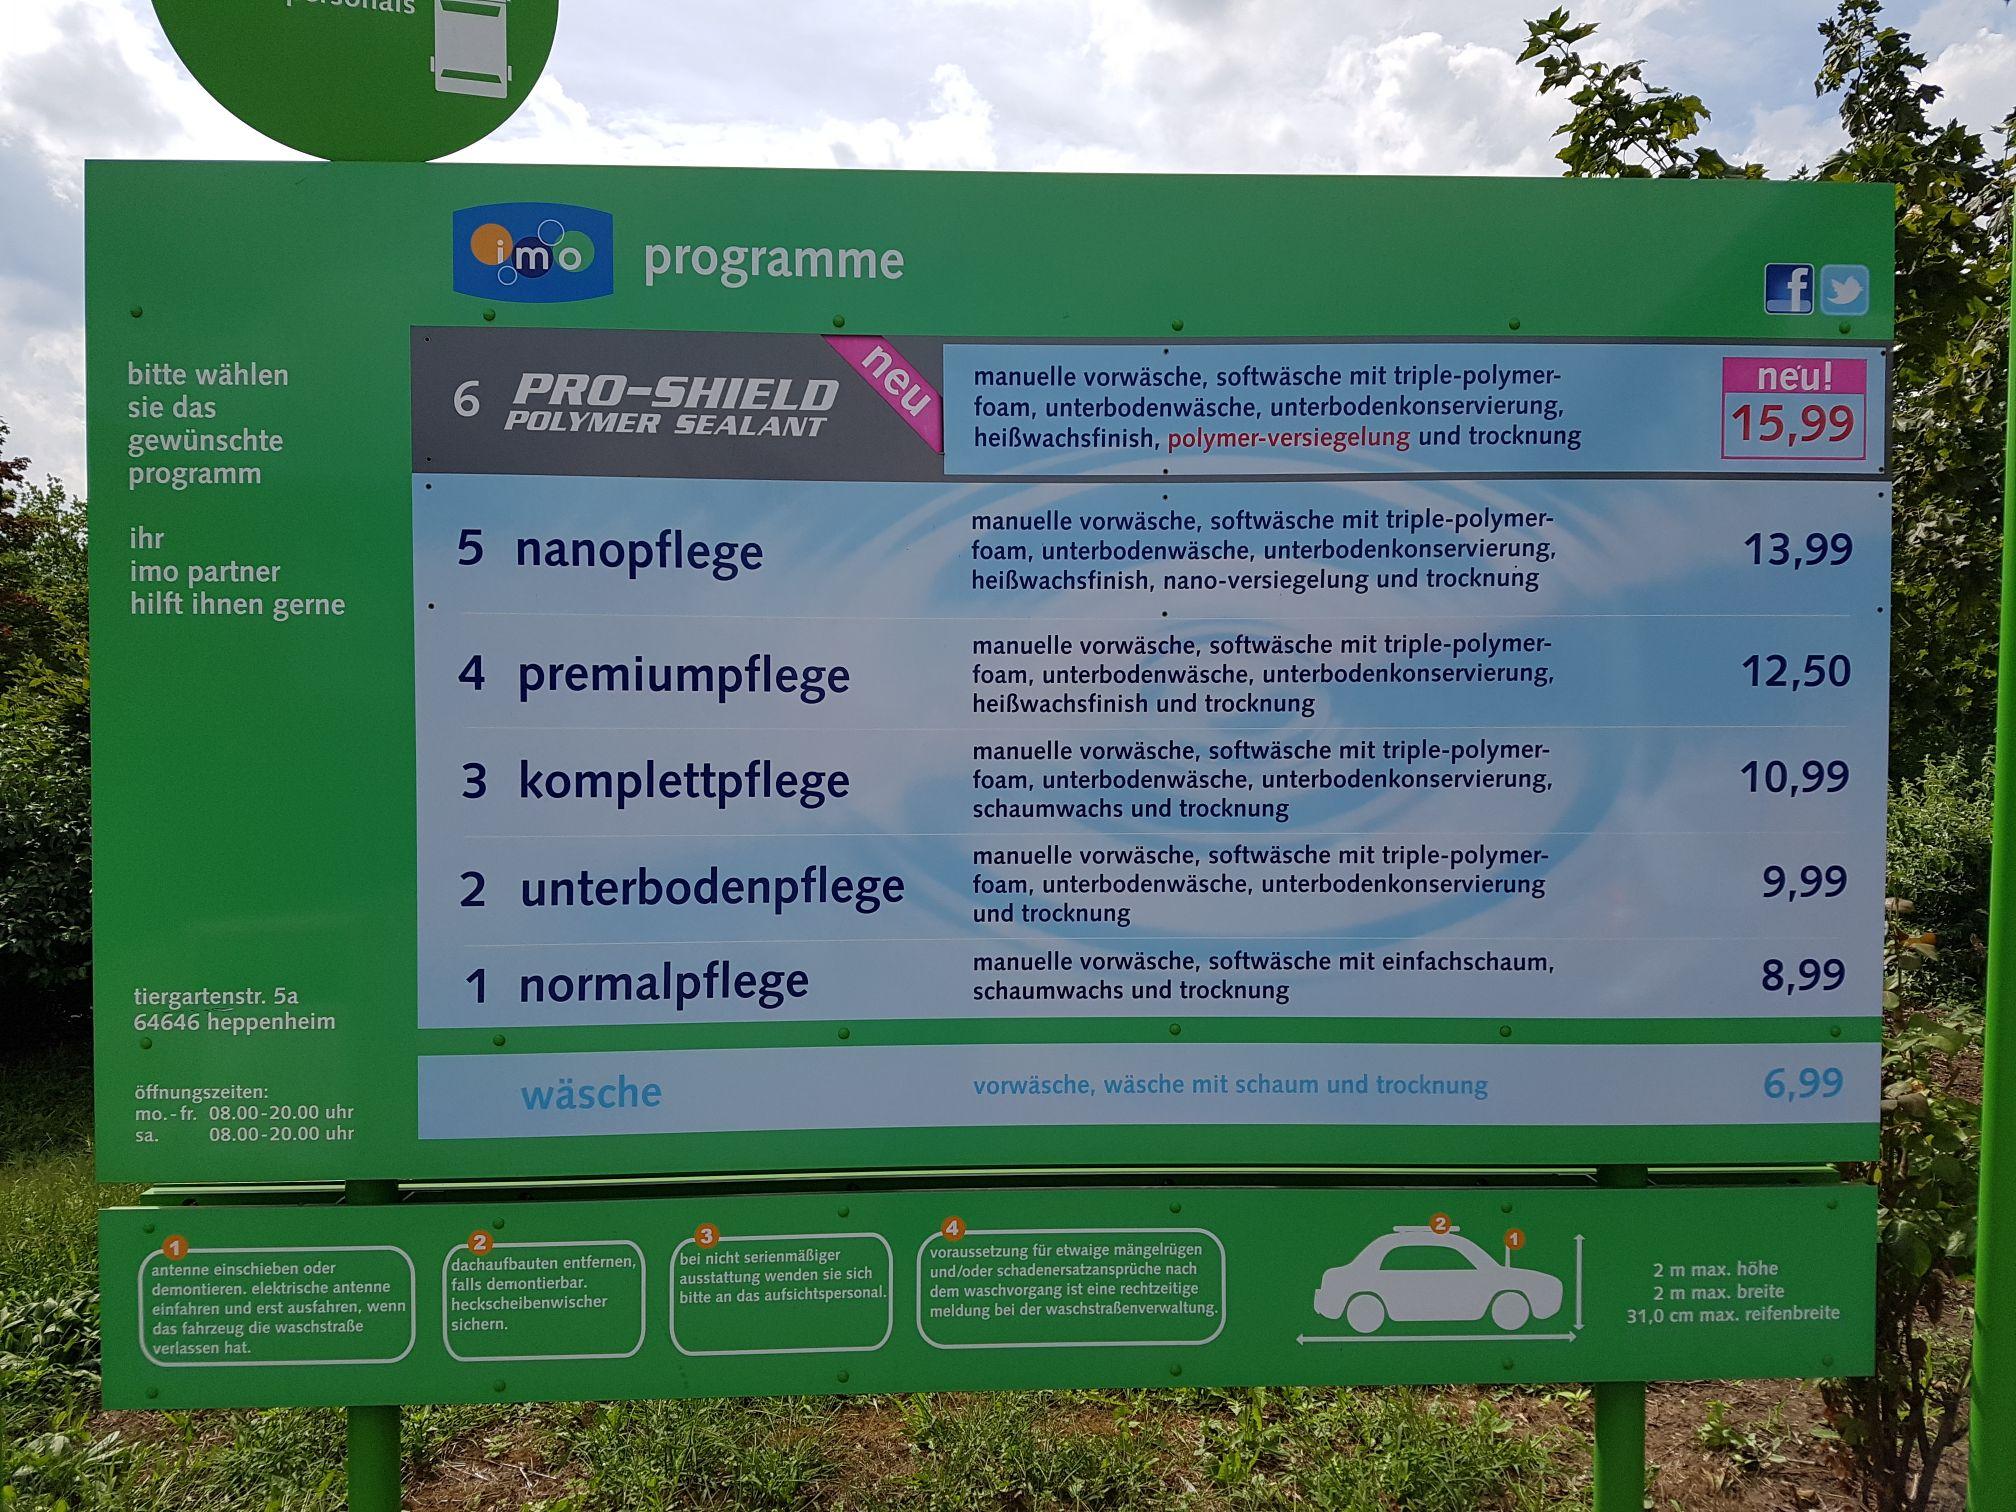 (Lokal) IMO Heppenheim am Rewe Center - Tiergartenstraße